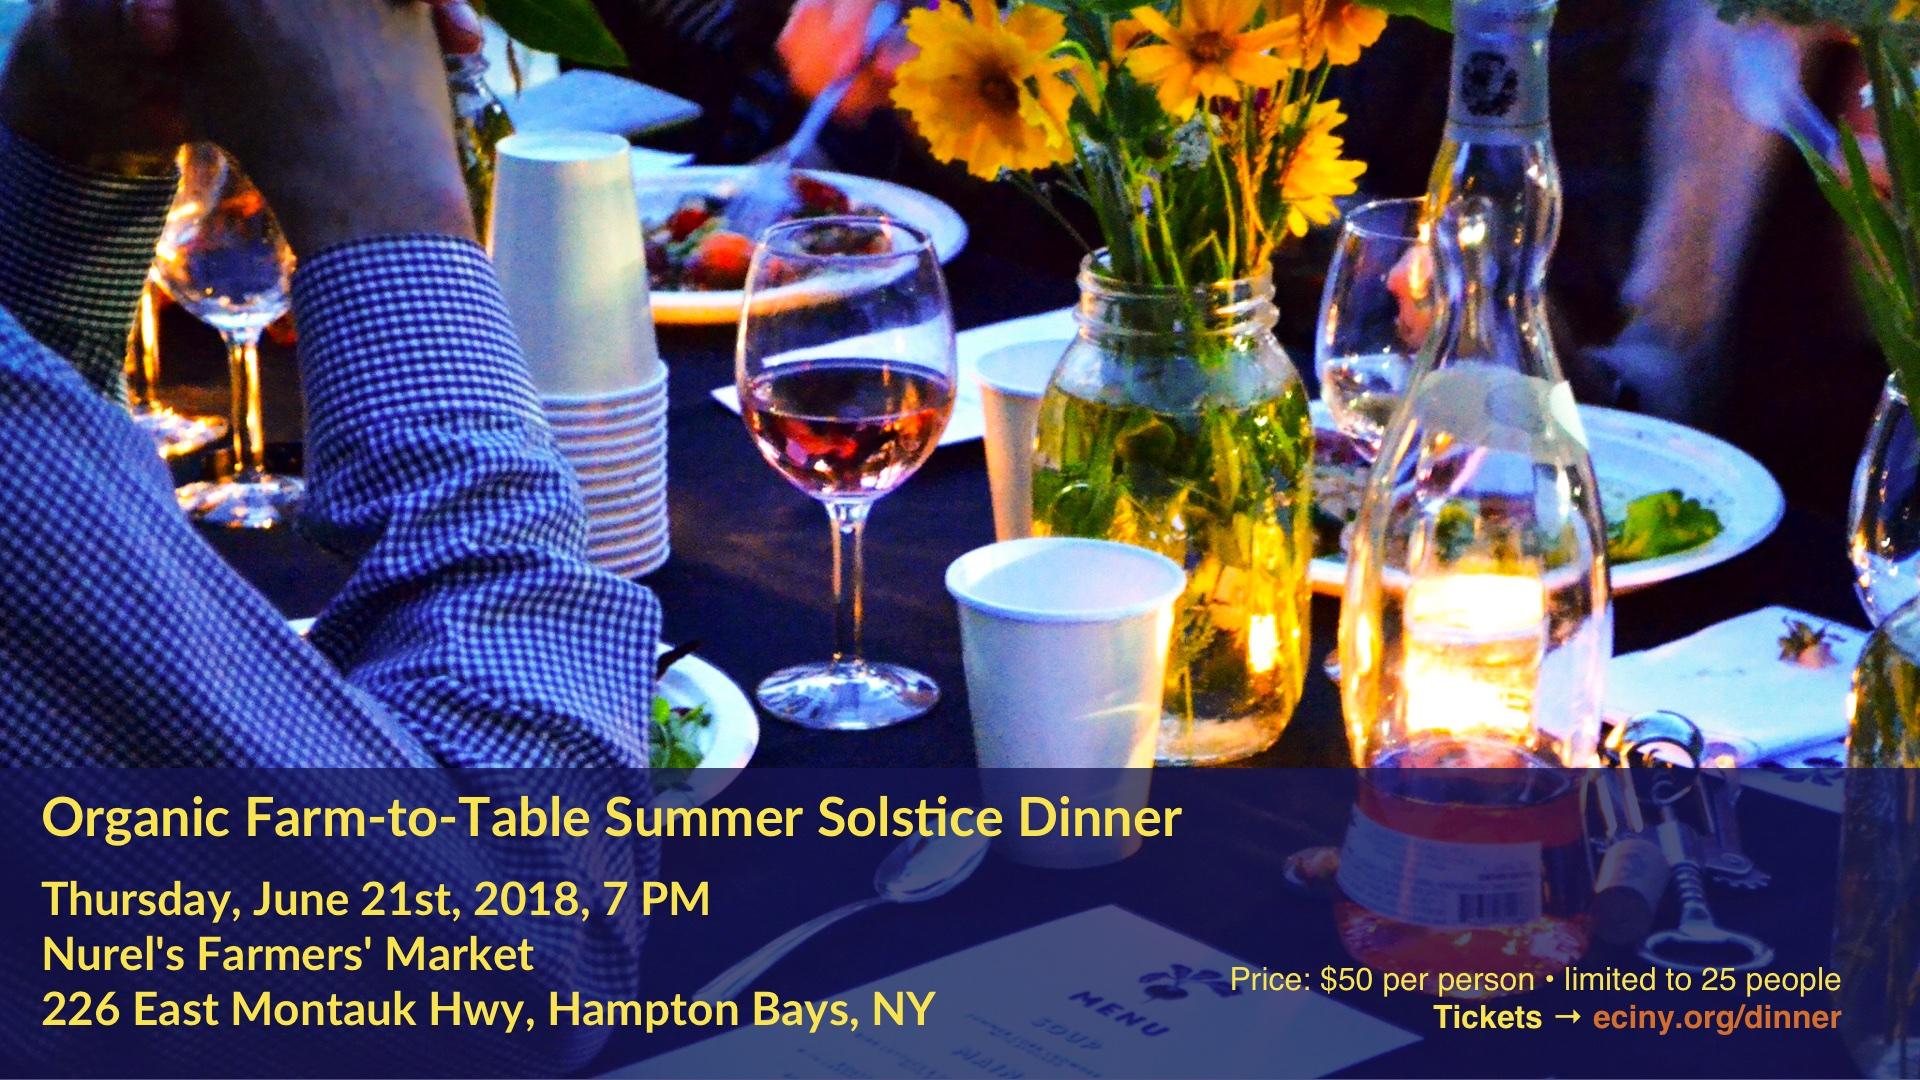 Organic Farm-to-Table Summer Solstice Dinner - June 21, 2018 - FB cover 1920x1080.jpg